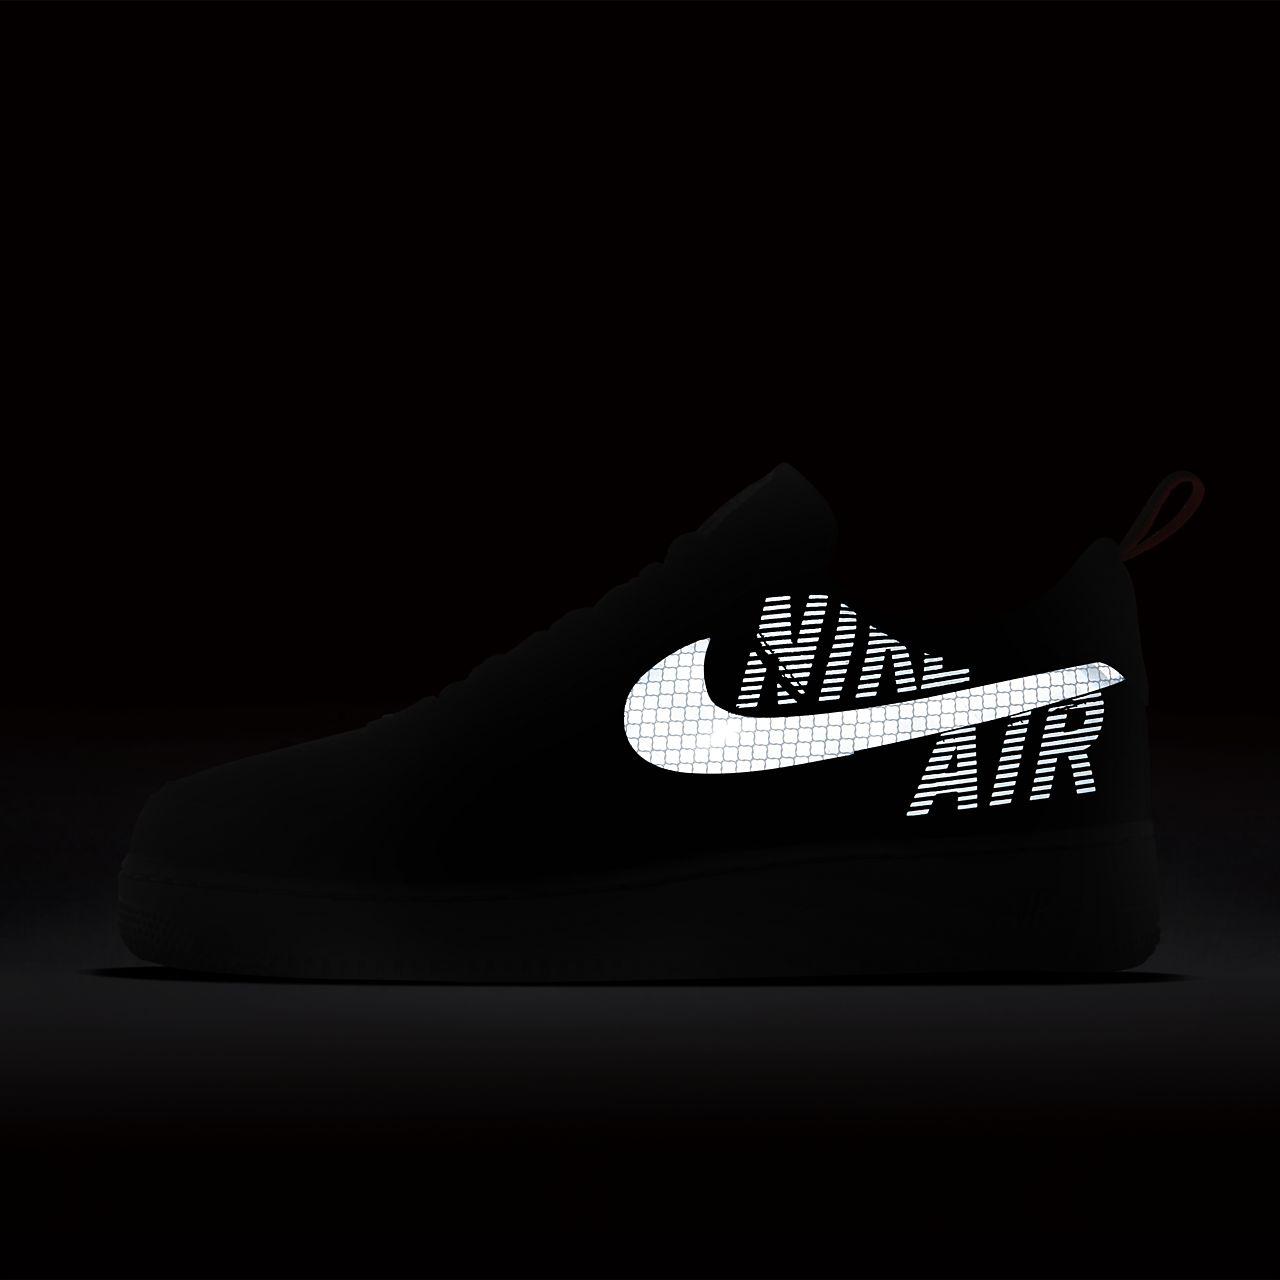 Nike Air Force 1 '07 LV8 Black Pure Platinum AO2439 002 DW